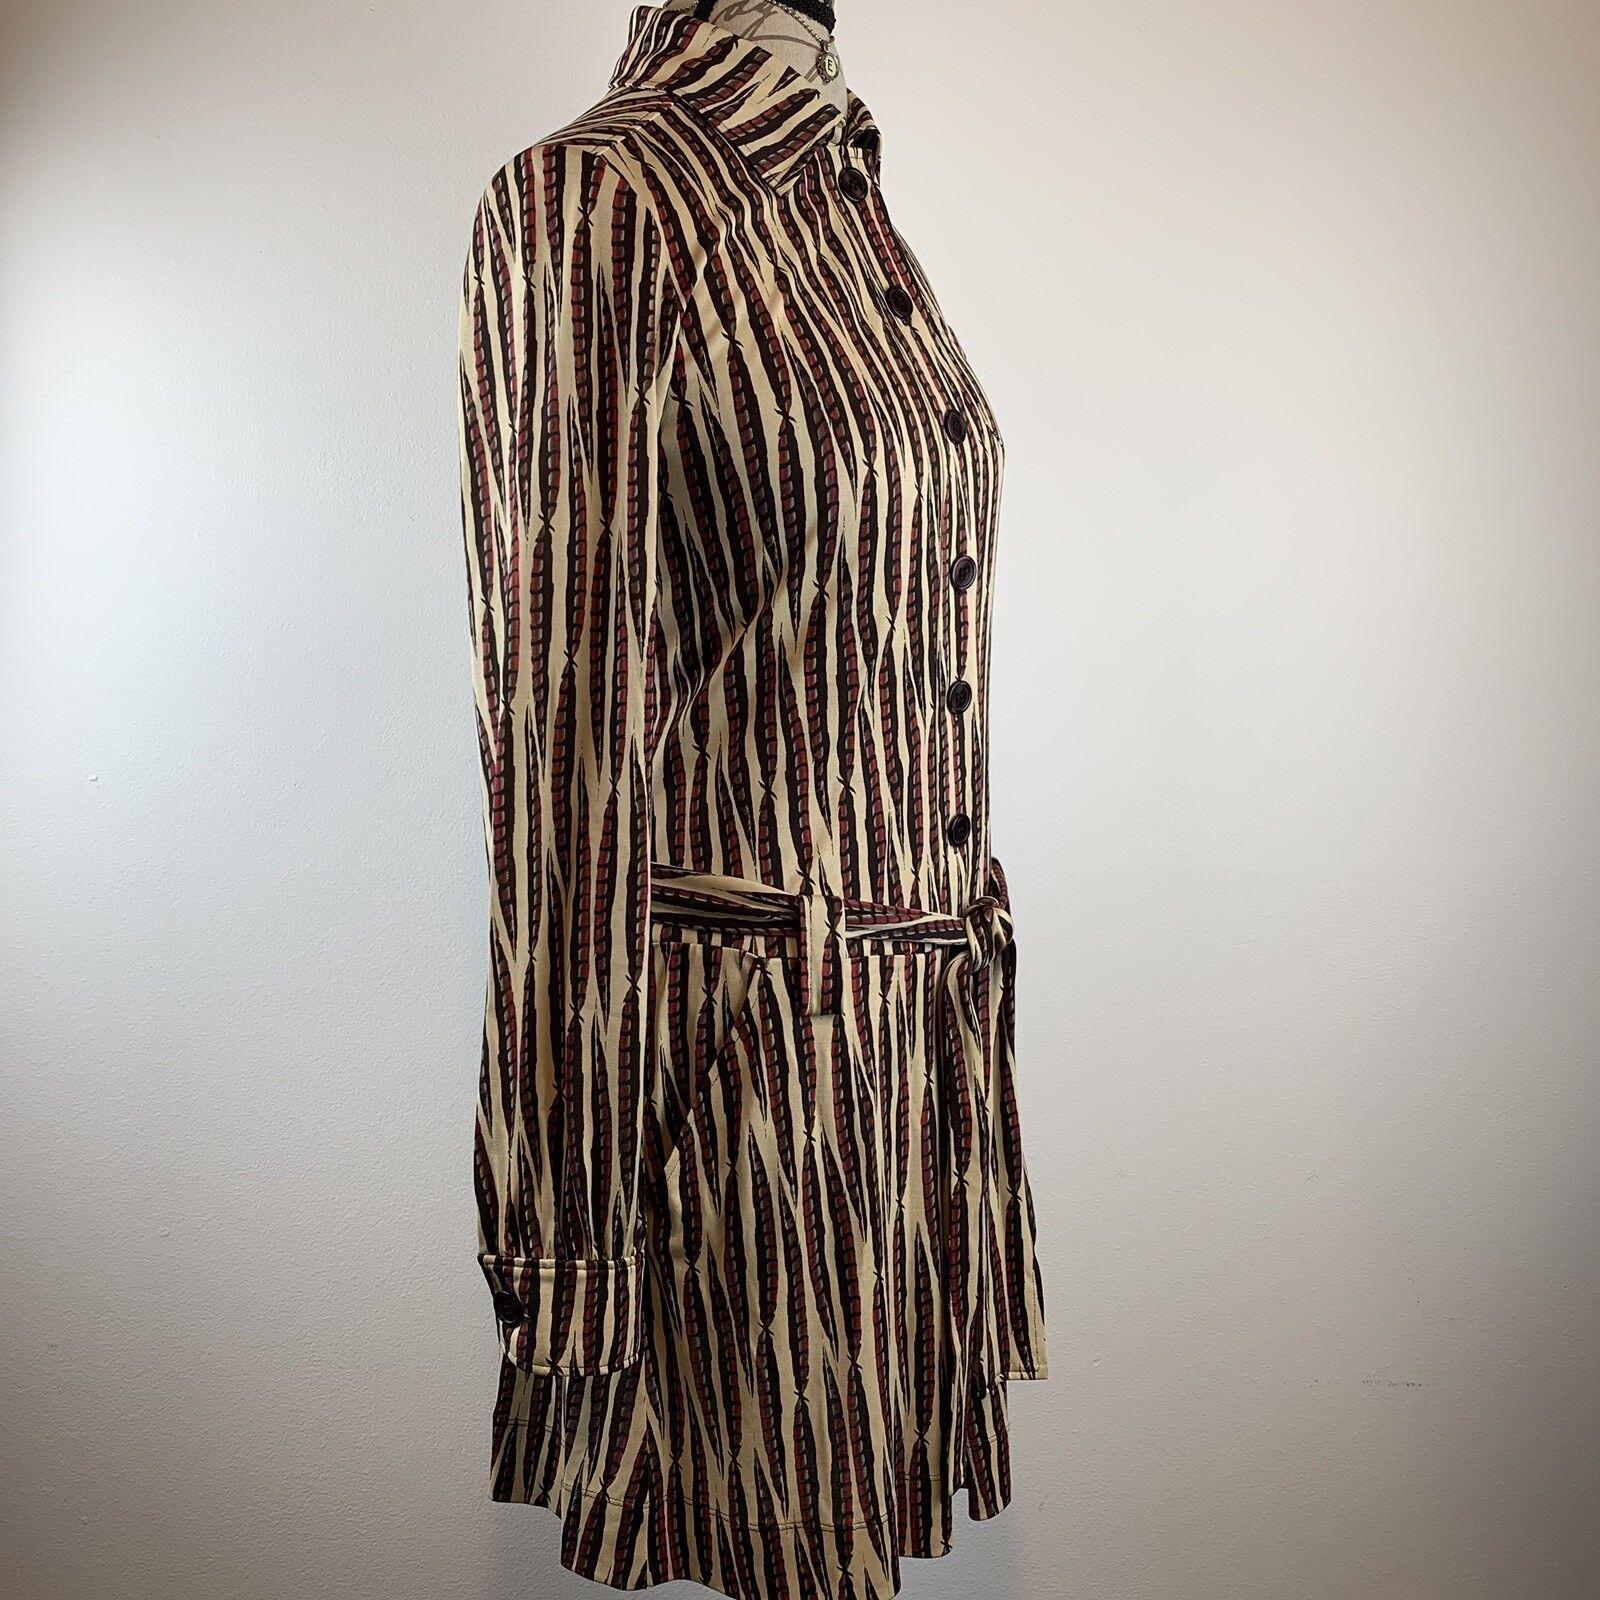 Diane Von Furstenberg Womens Sheena Sheena Sheena Silk Dress Long Sleeve Feather Print Size 8 dfd758